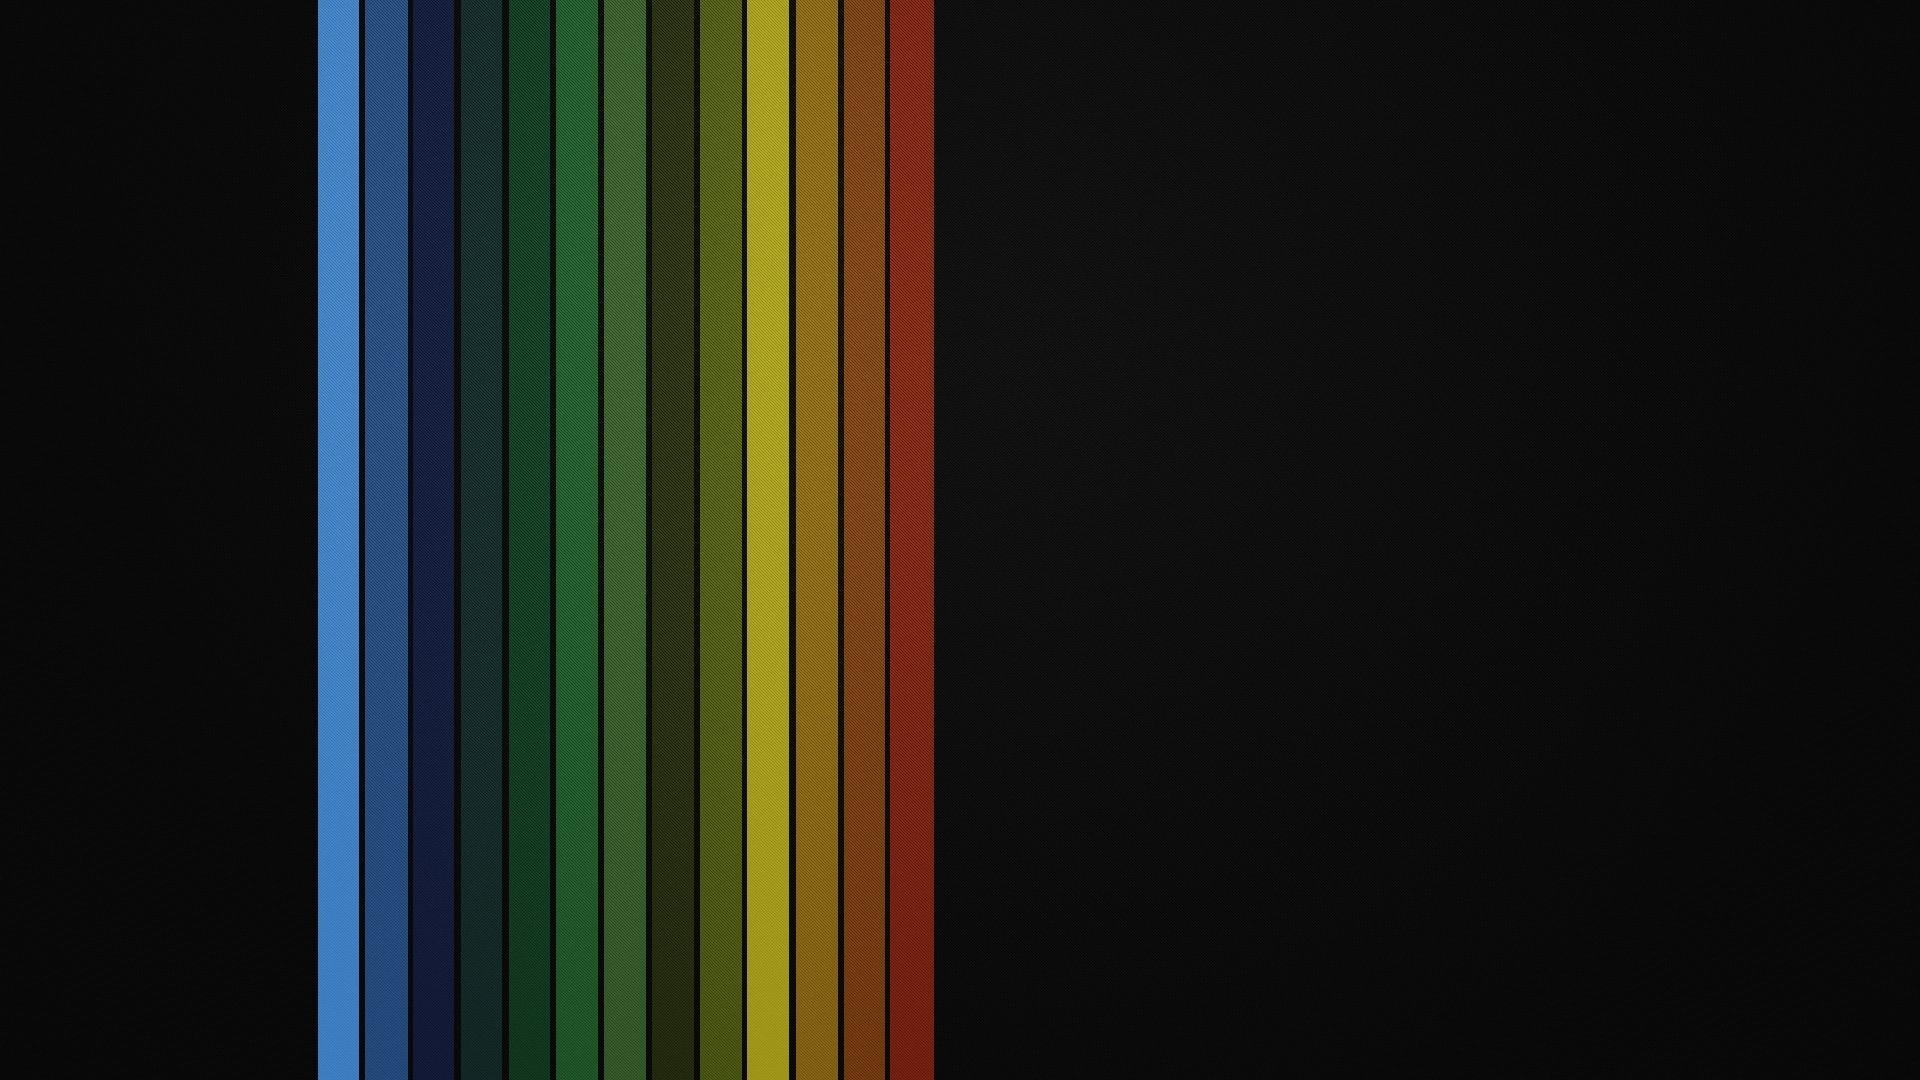 Minimalistic Stripes High Quality